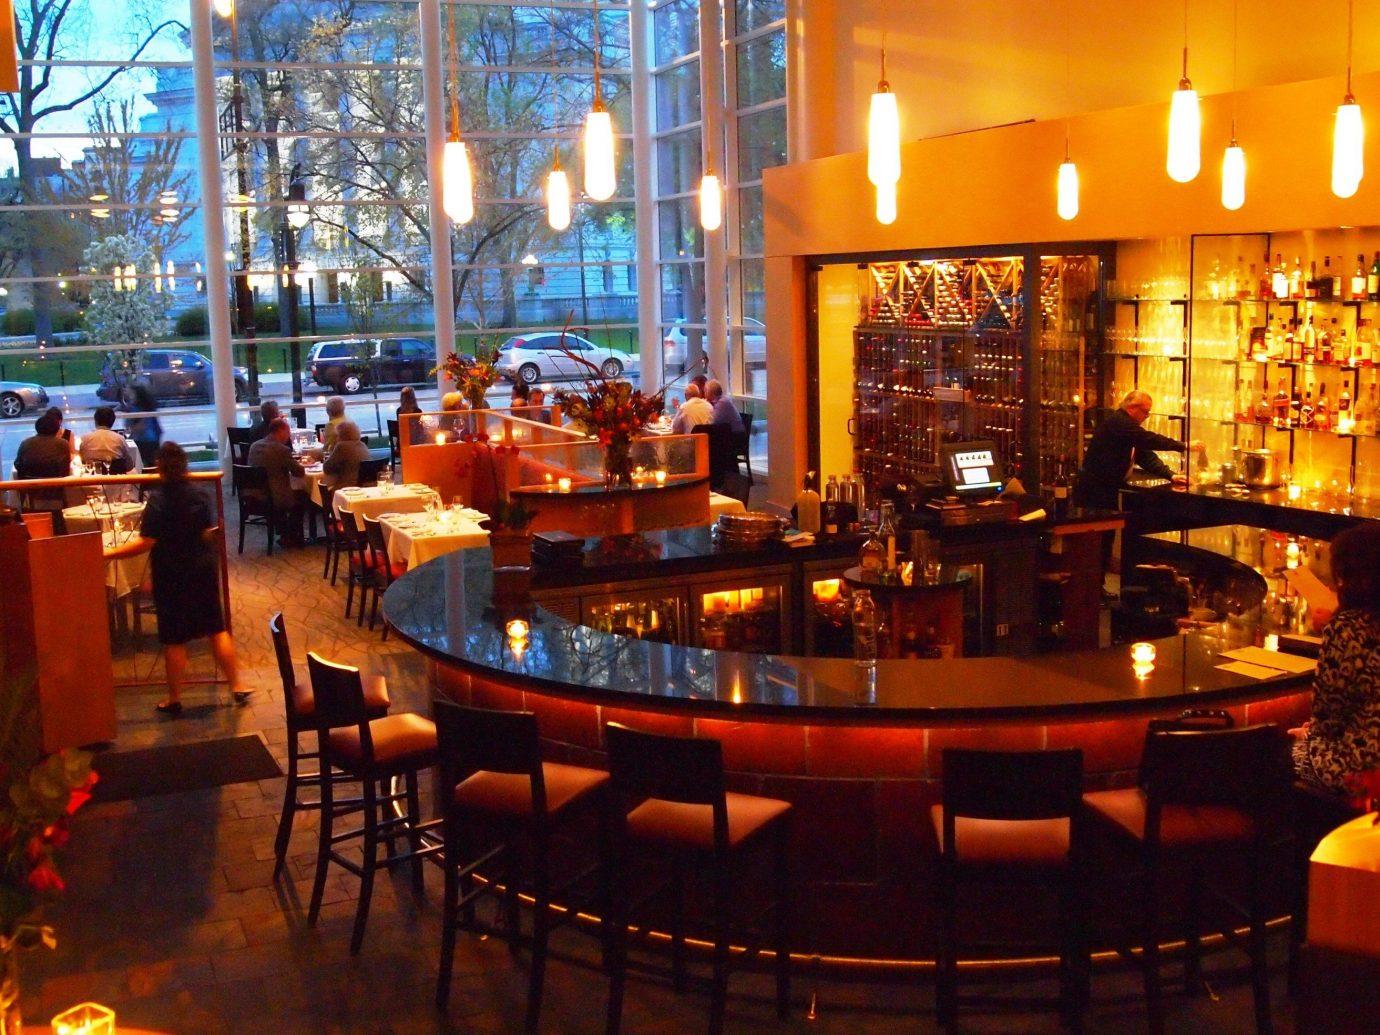 Road Trips Trip Ideas table indoor floor restaurant Bar ceiling café tavern interior design coffeehouse